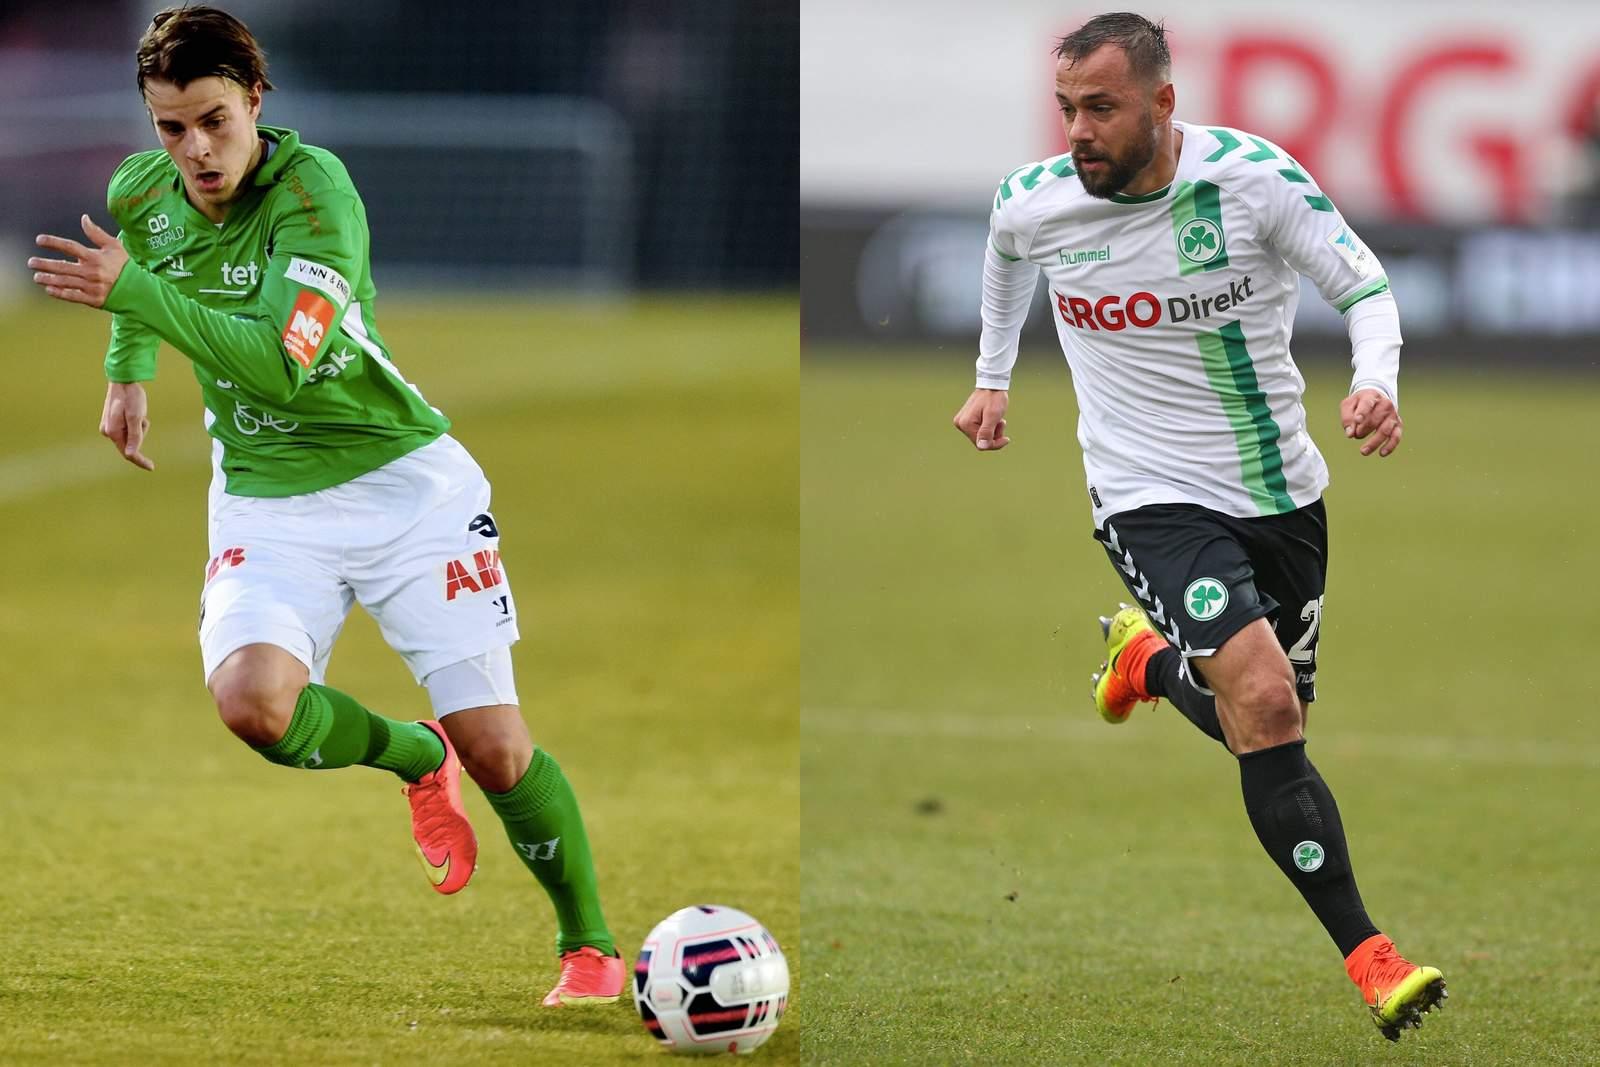 Roope Riski und Sebastian Heidinger